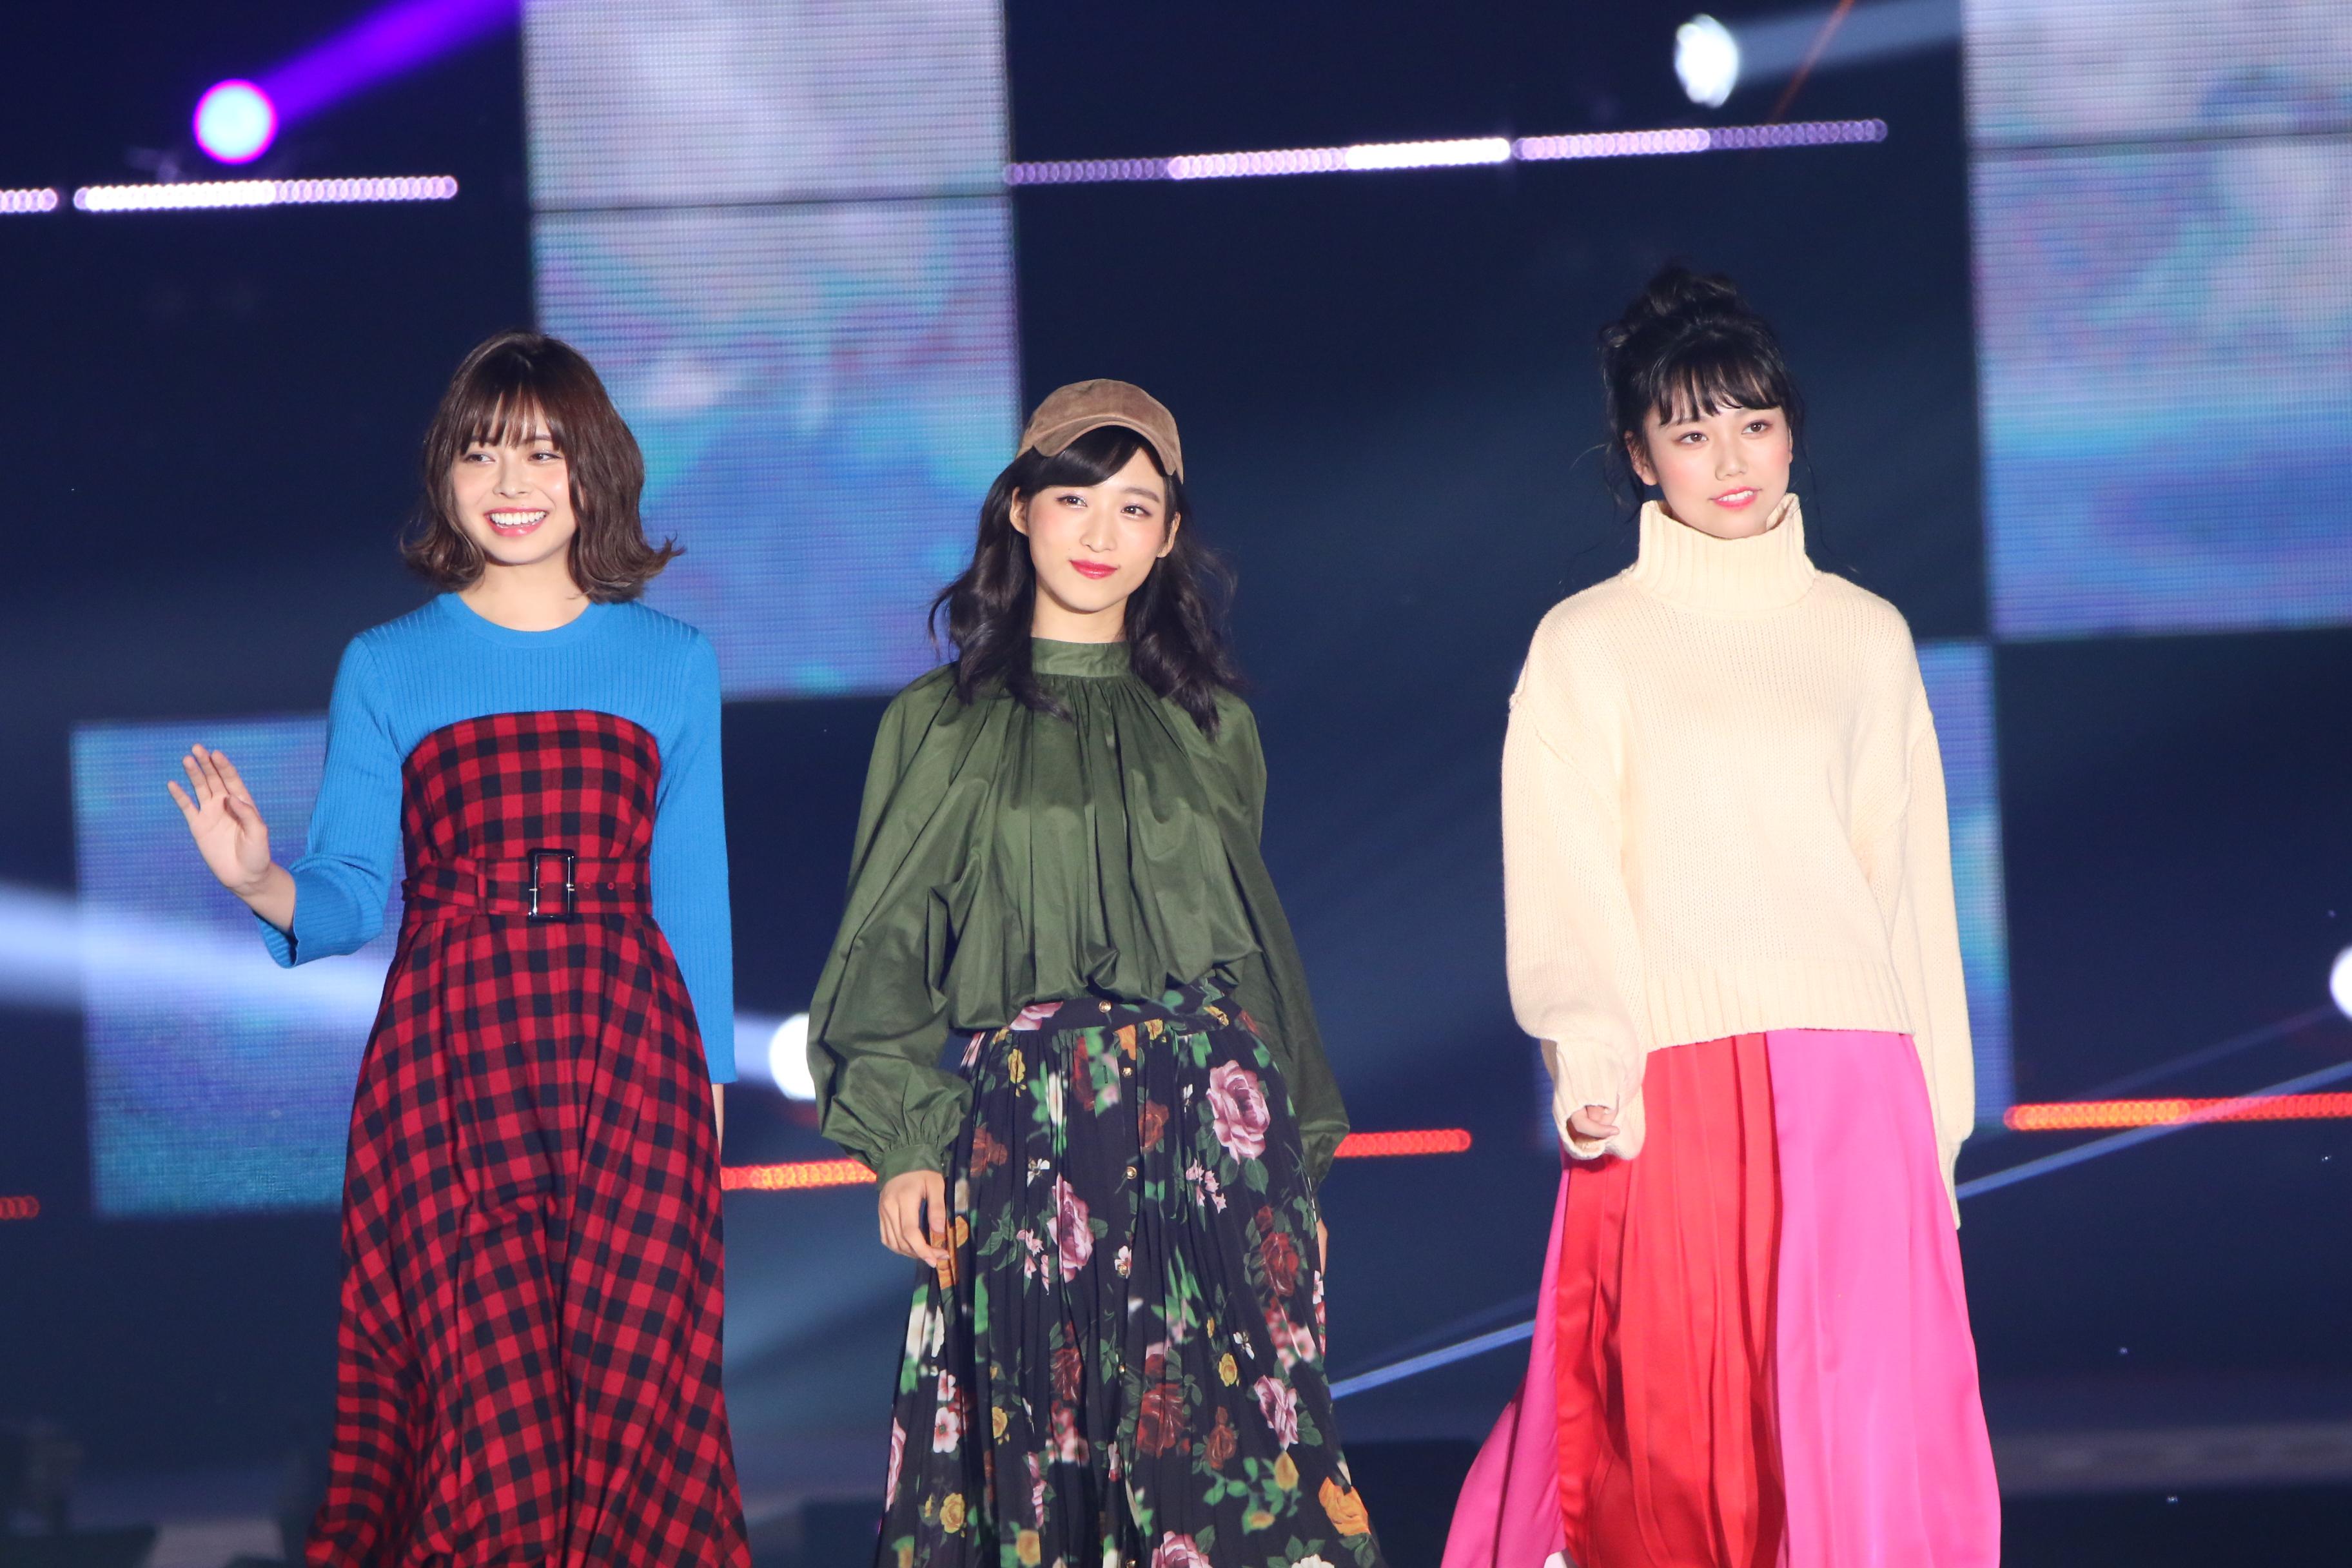 「GirlsAward 2018」でのAKB48チーム8の人見古都音、小栗有以、長久玲奈